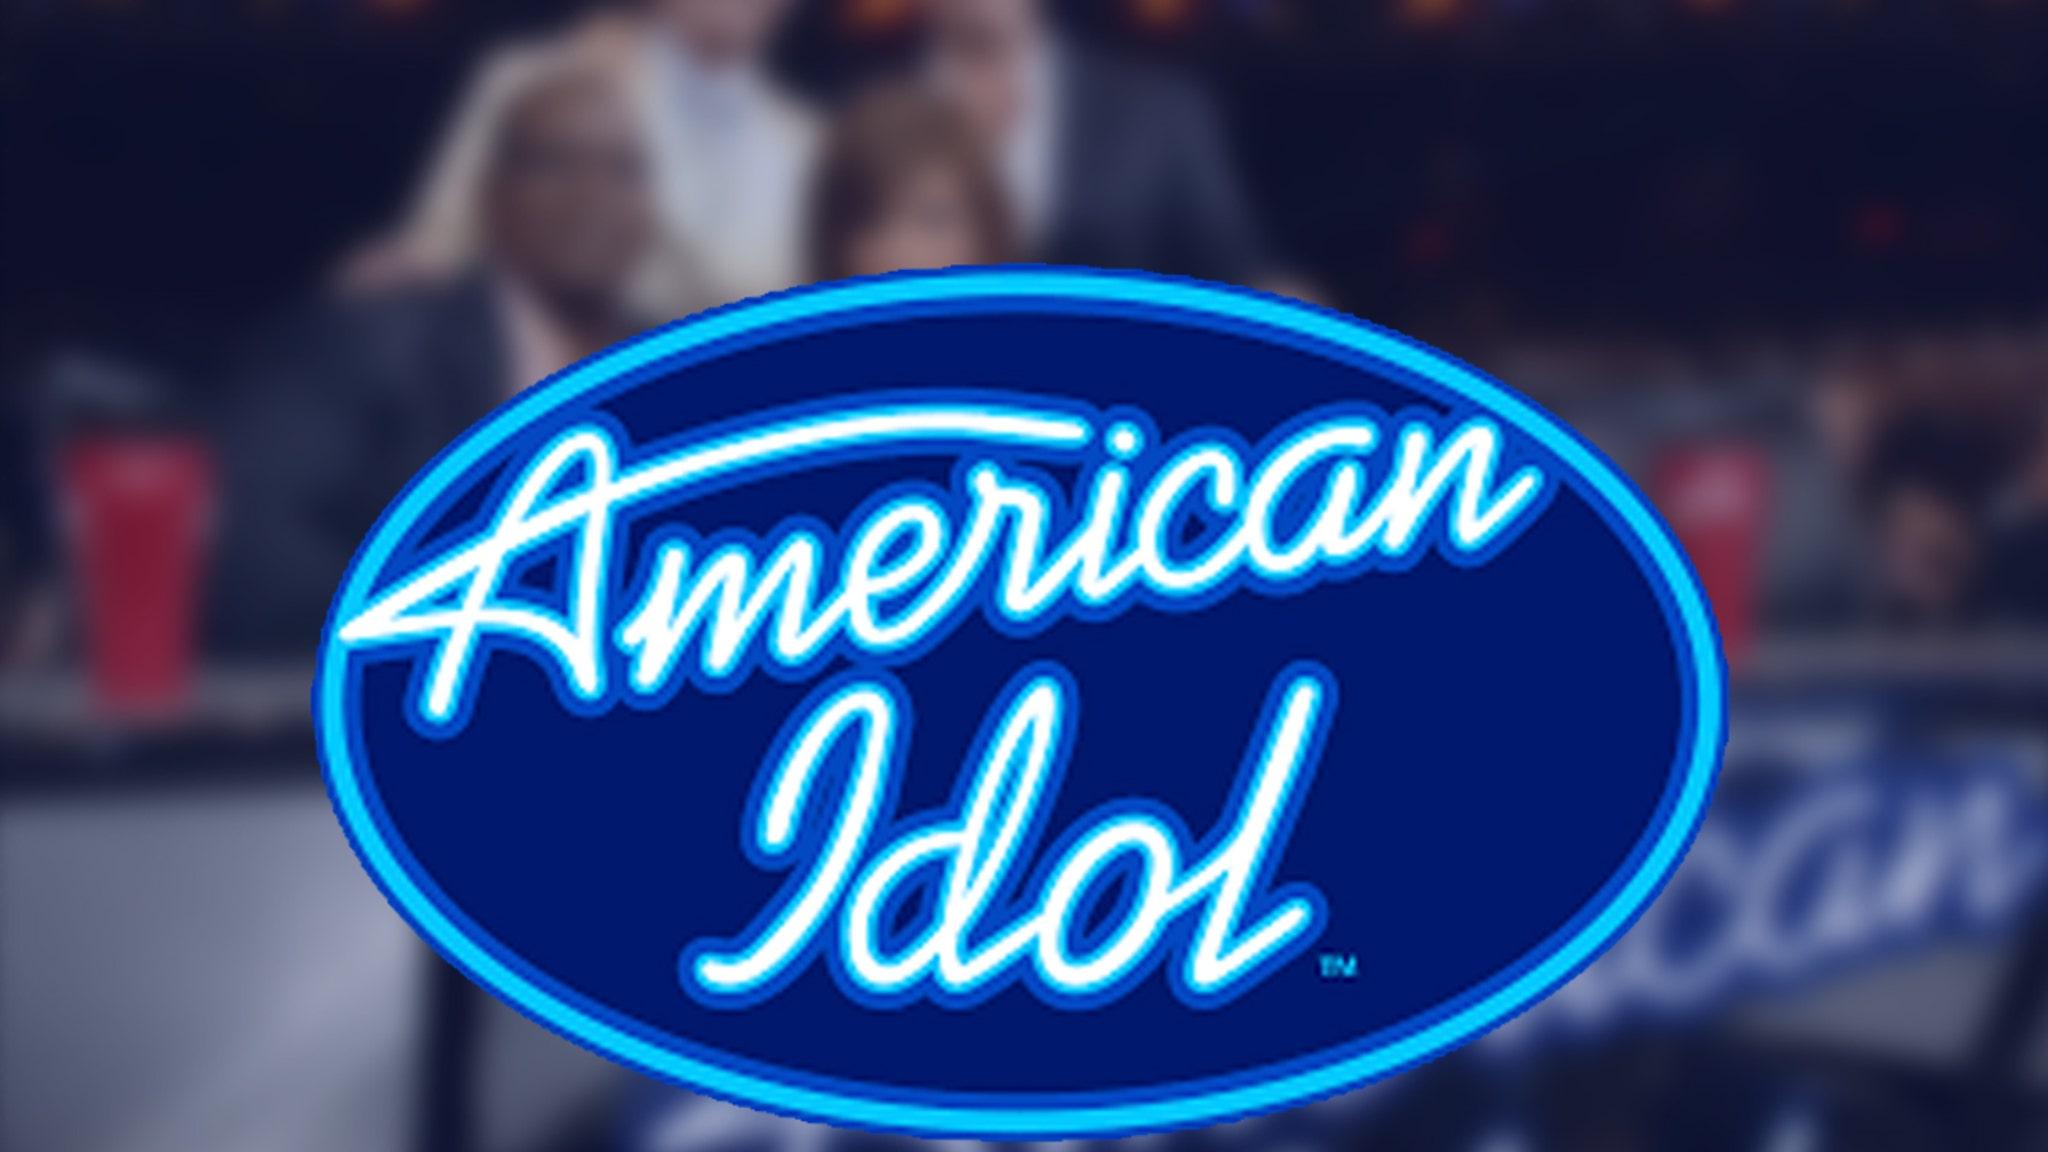 'American Idol' Season Abandons Filming in Studio Because of Coronavirus